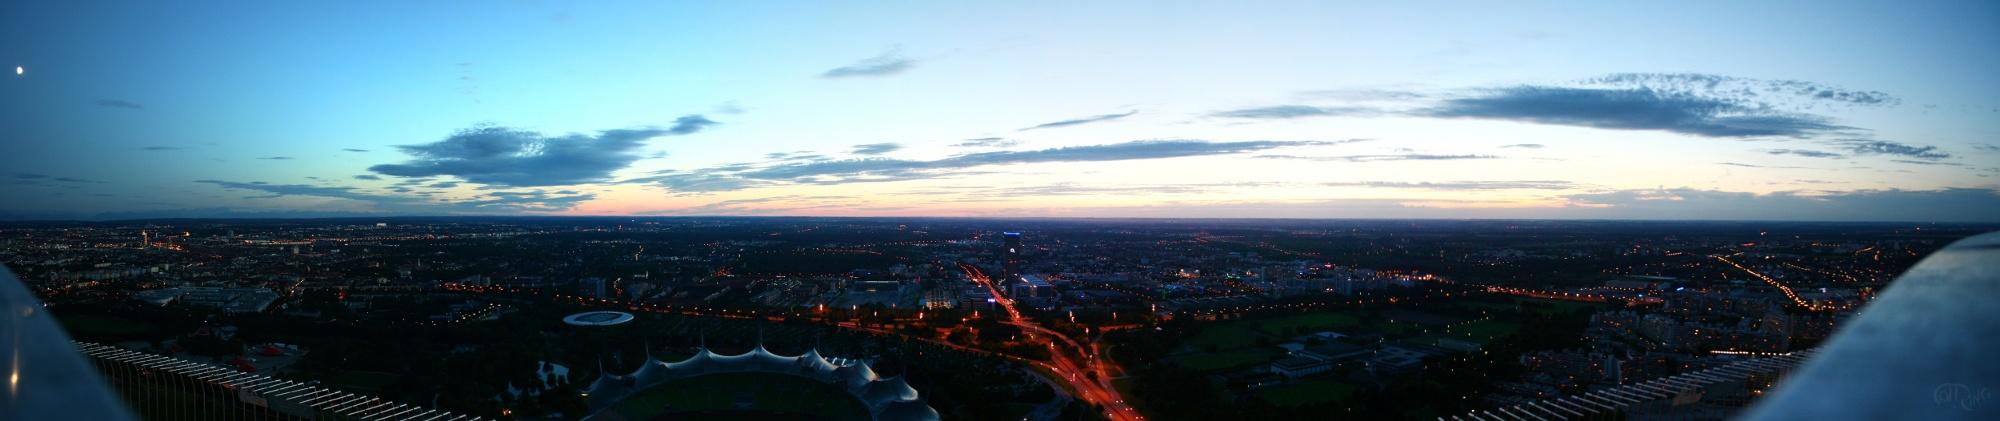 München nocturno